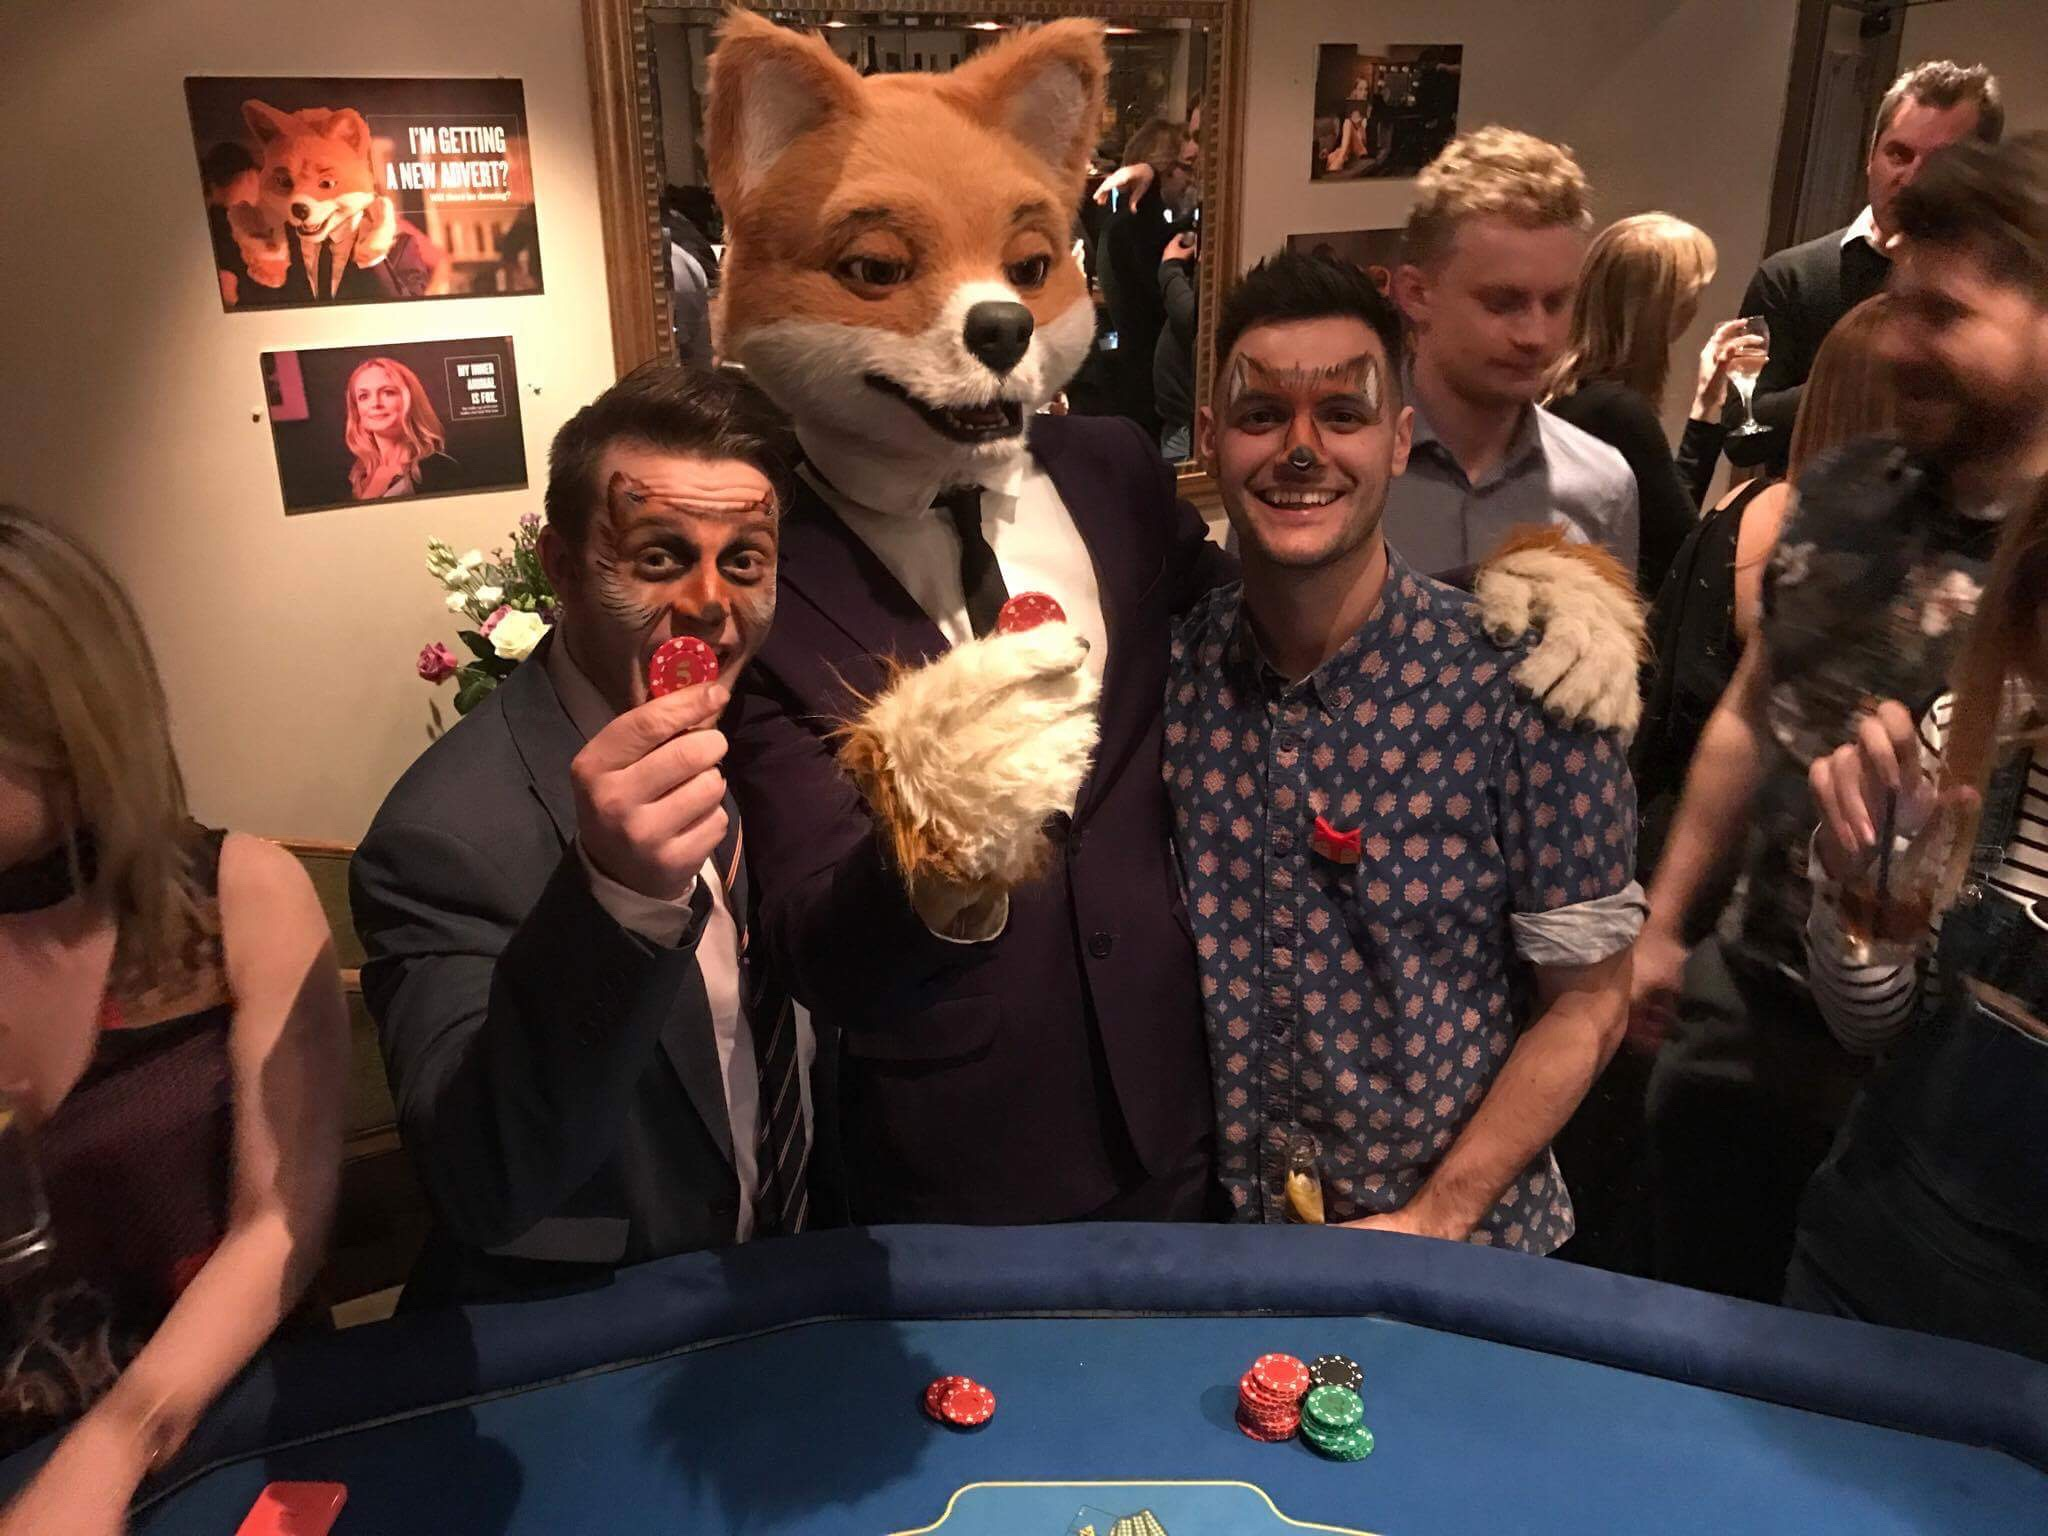 foxy bingo outfit playing poker